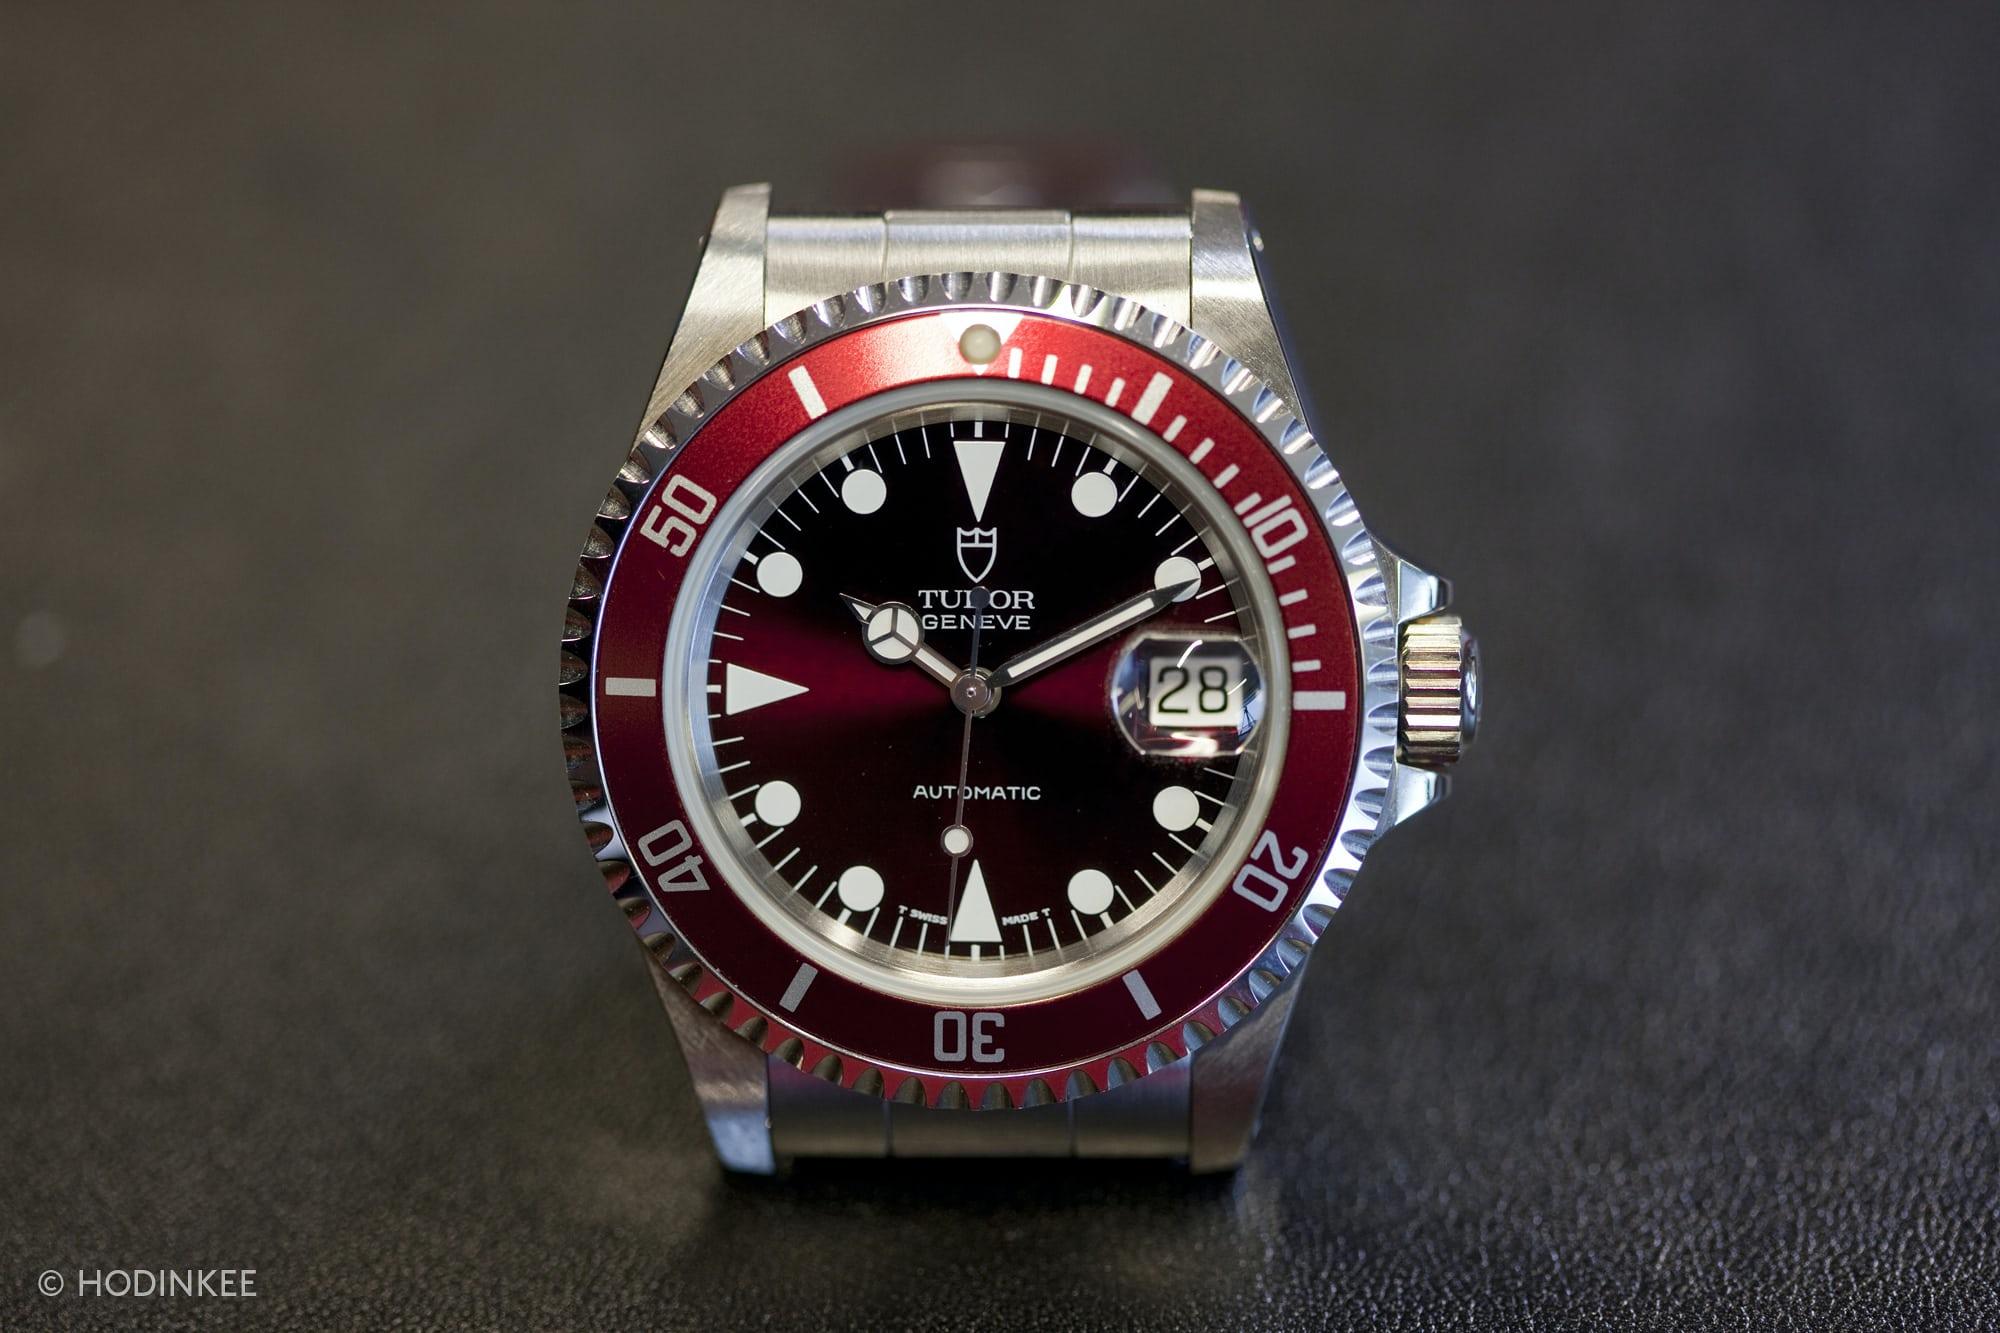 Tudor Submariner burgundy red prototype